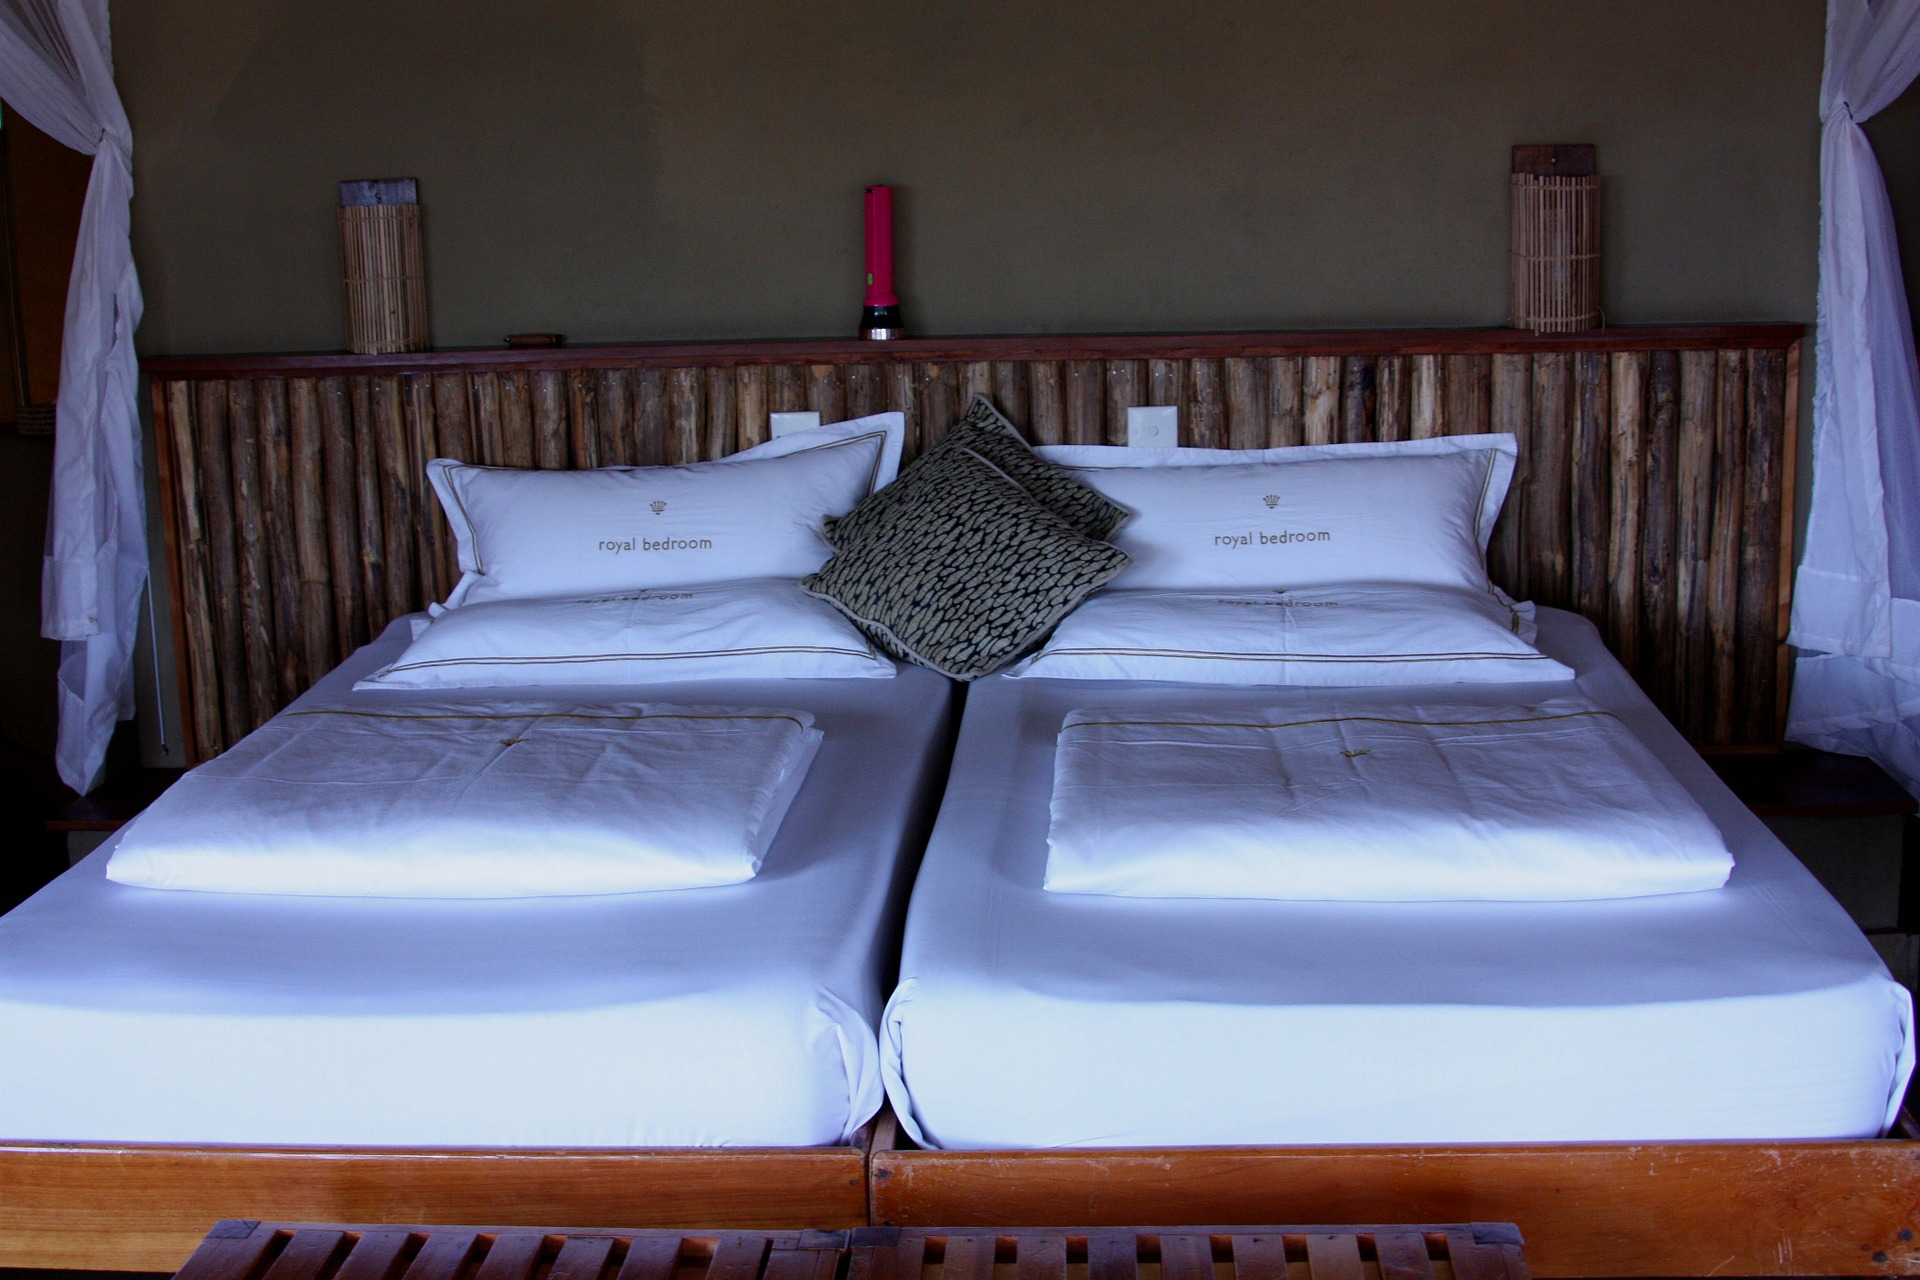 МатраС или матраЦ? На чем спят грамотные люди?